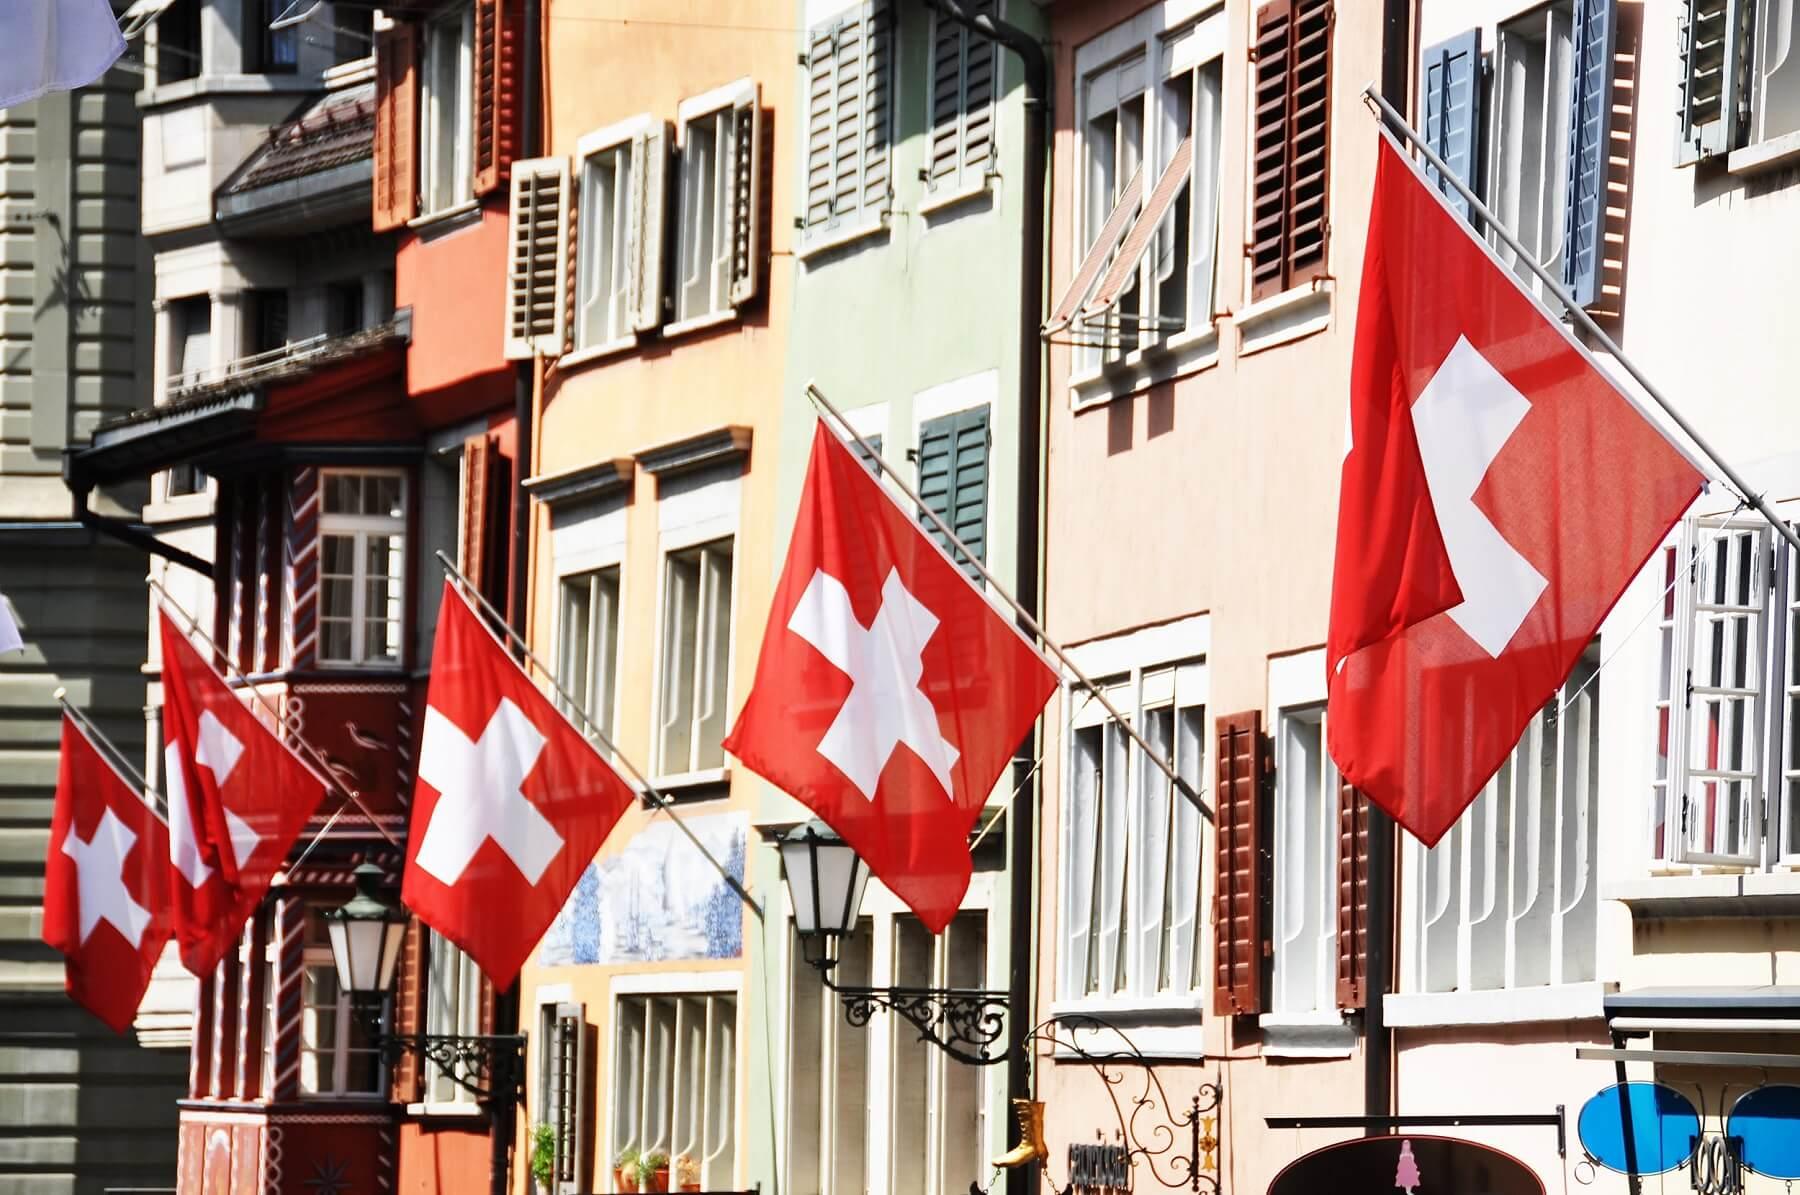 Berne, la « pépite » suisse à visiter d'urgence